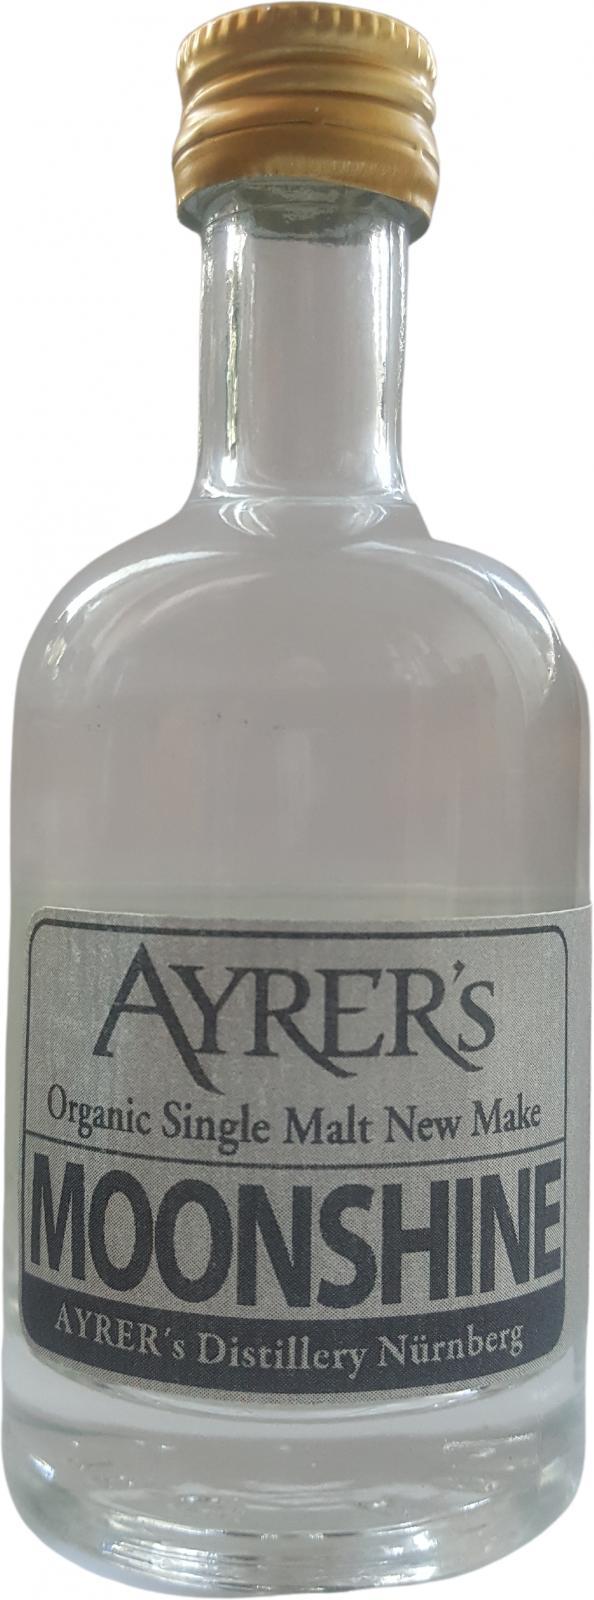 Ayrer's Moonshine